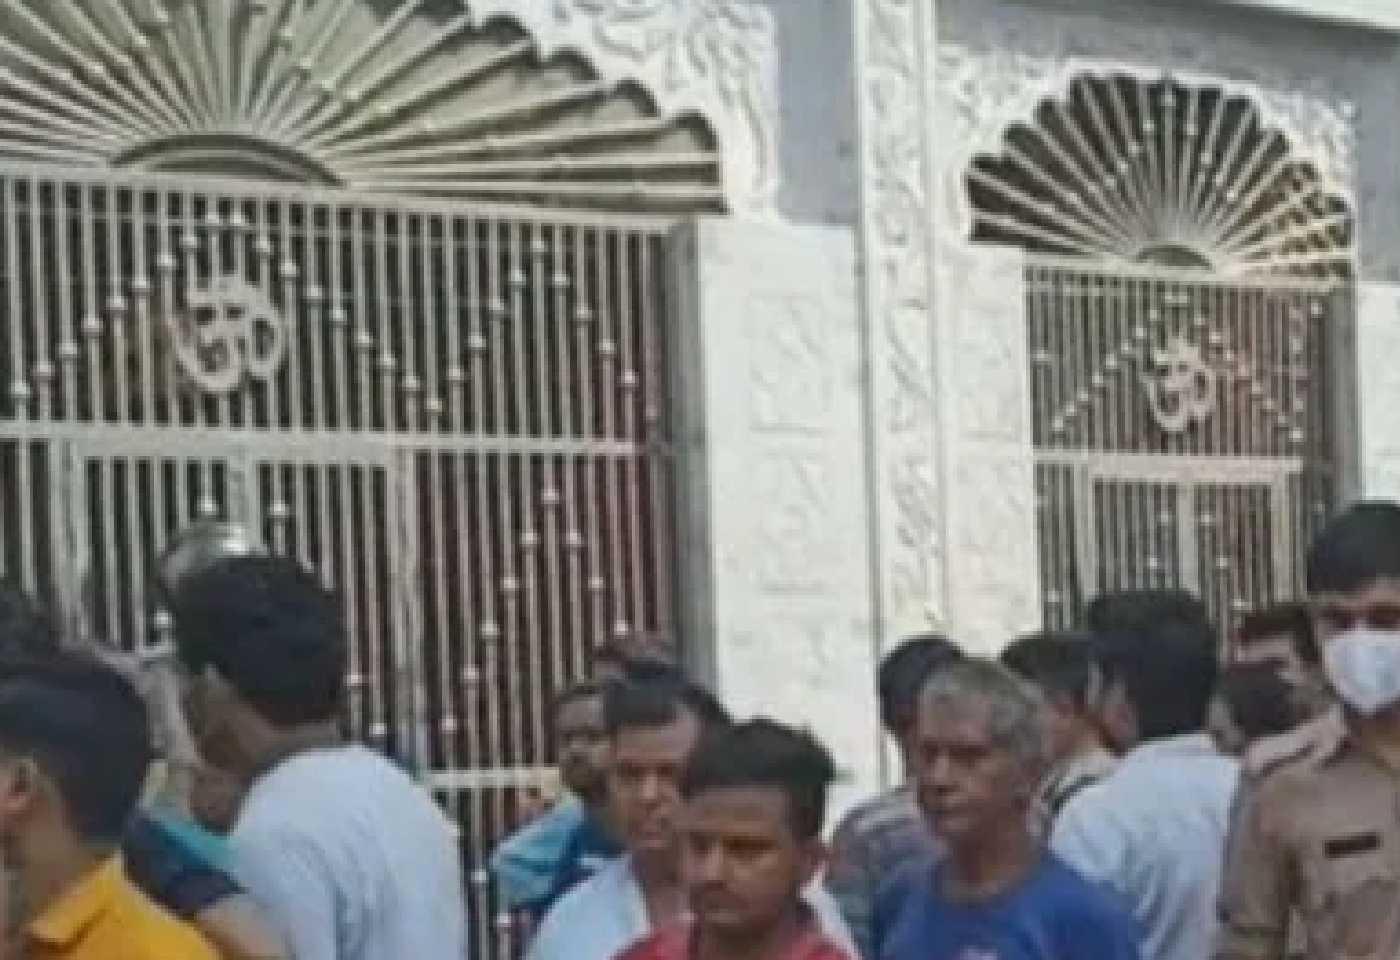 kanpur city tension create in chhibramau kannauj after god statue broken in temple